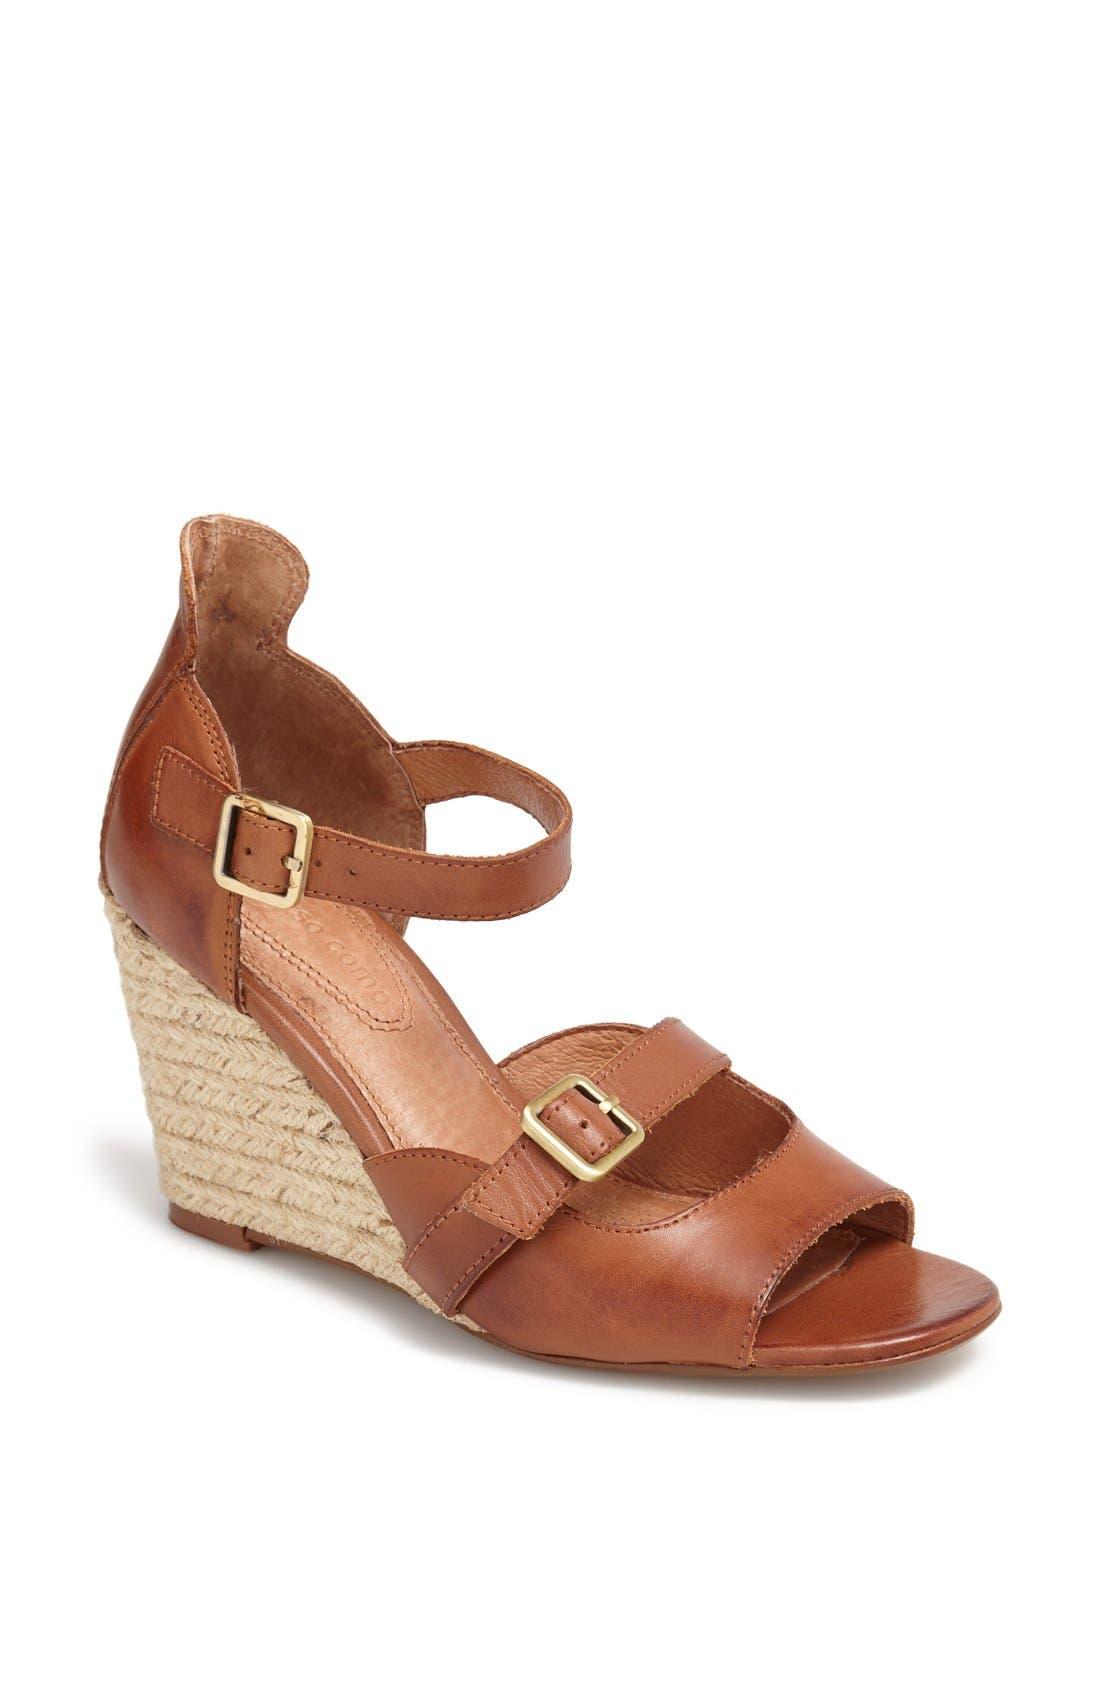 Alternate Image 1 Selected - Corso Como 'Hello' Calfskin Leather Sandal